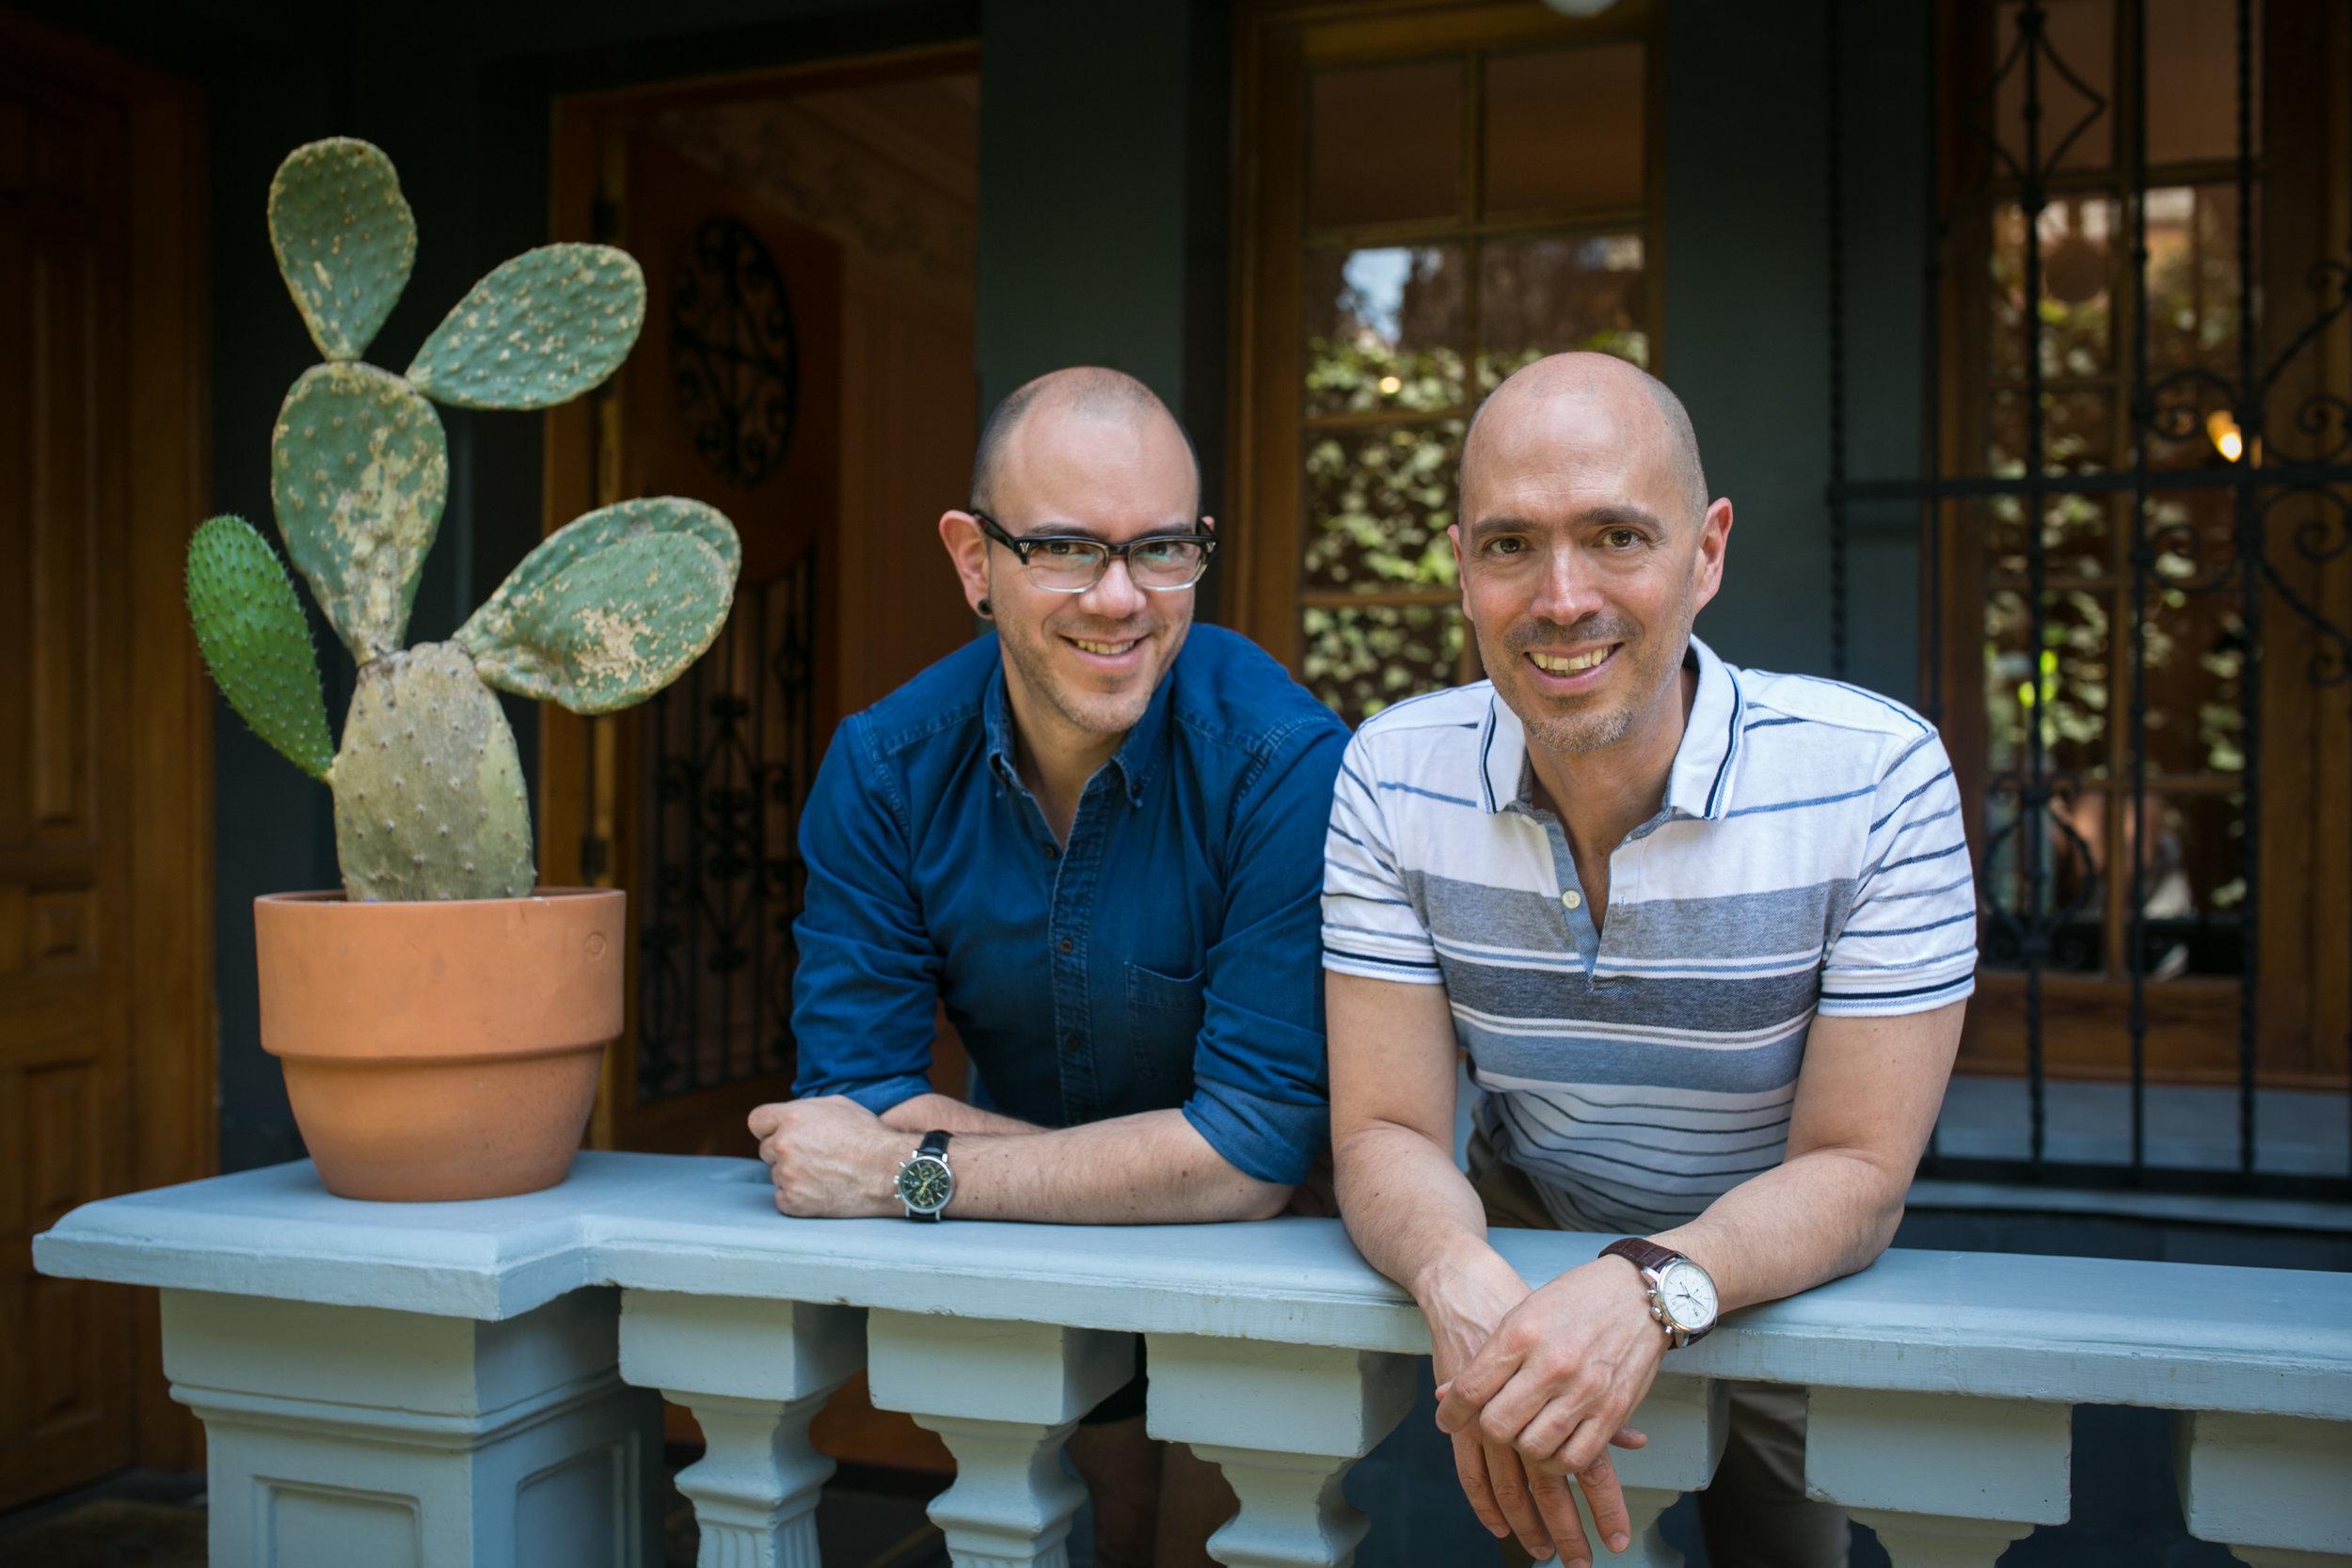 Copy of Jorge Fitz and Alberto Estua pose in front of Casa Jacaranda